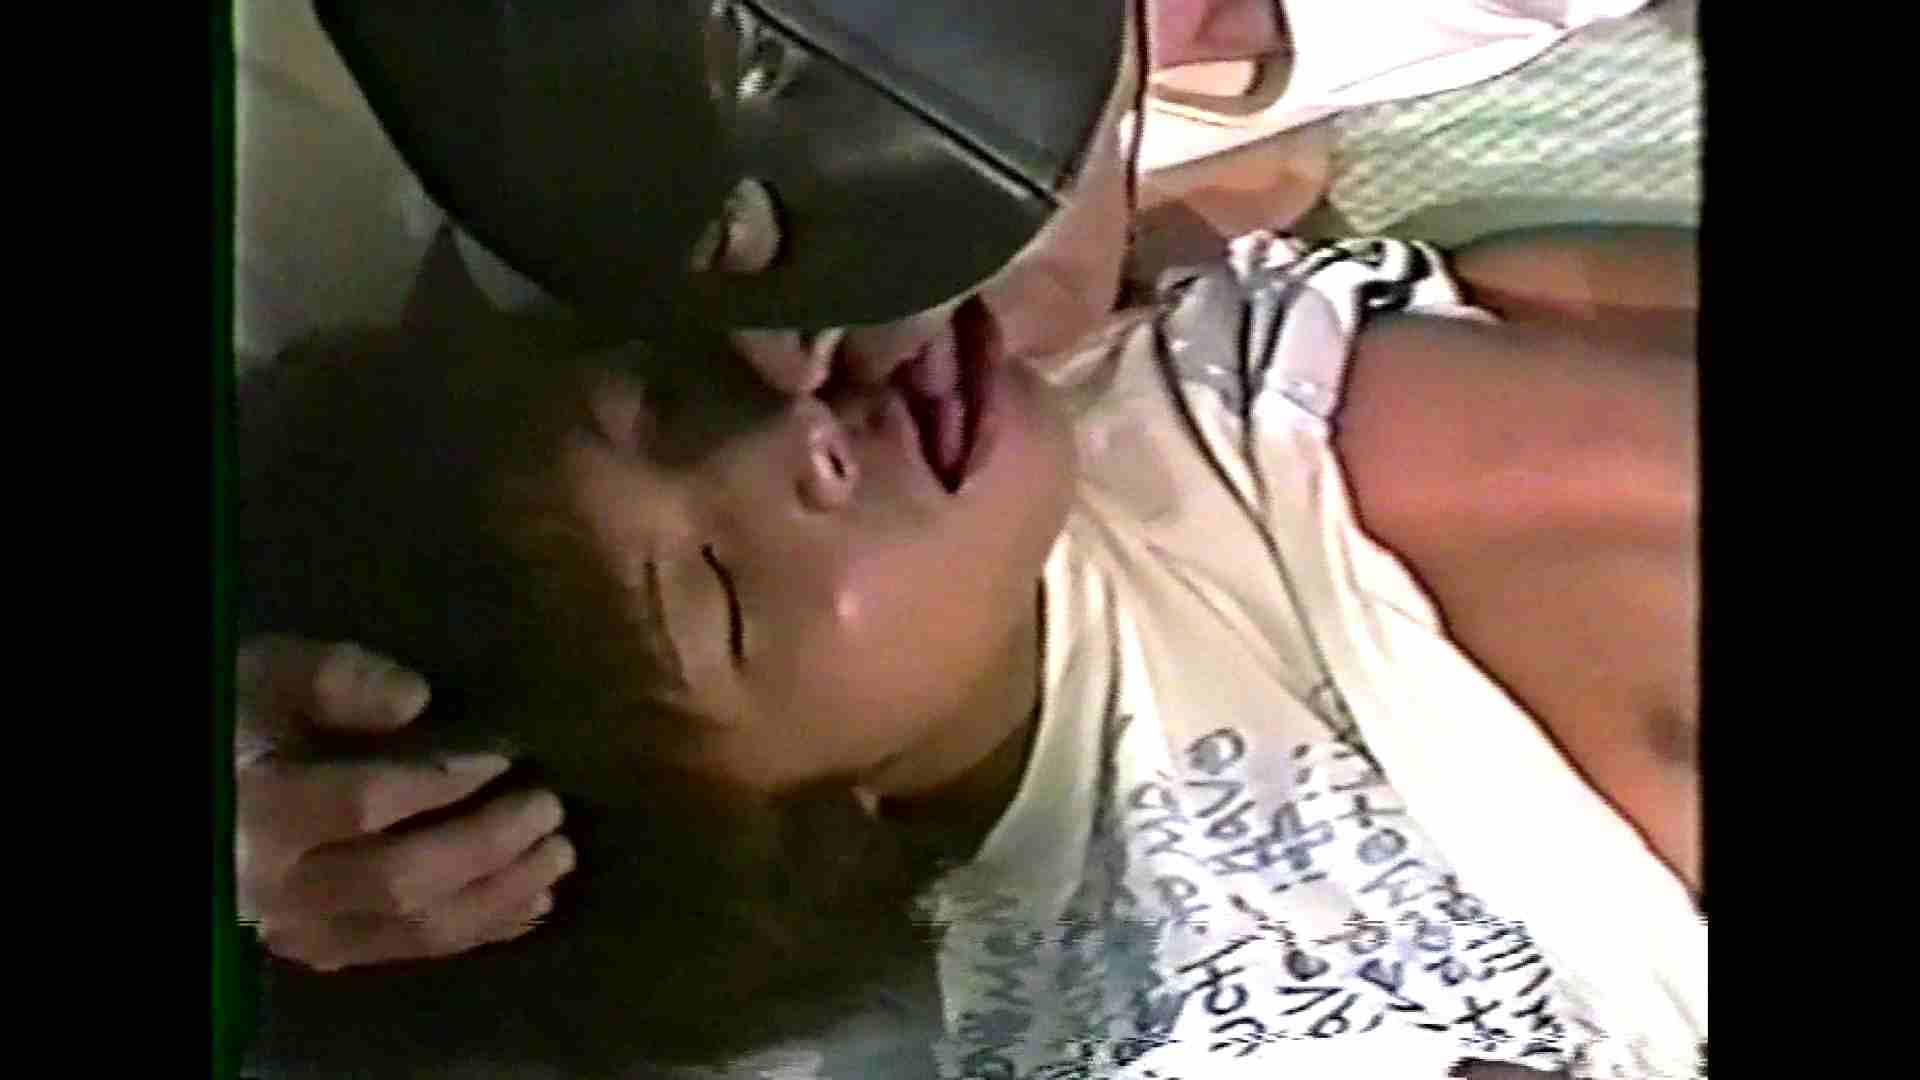 GAYBOY宏のオカズ倉庫Vol.3-1 無修正 ゲイヌード画像 98pic 24